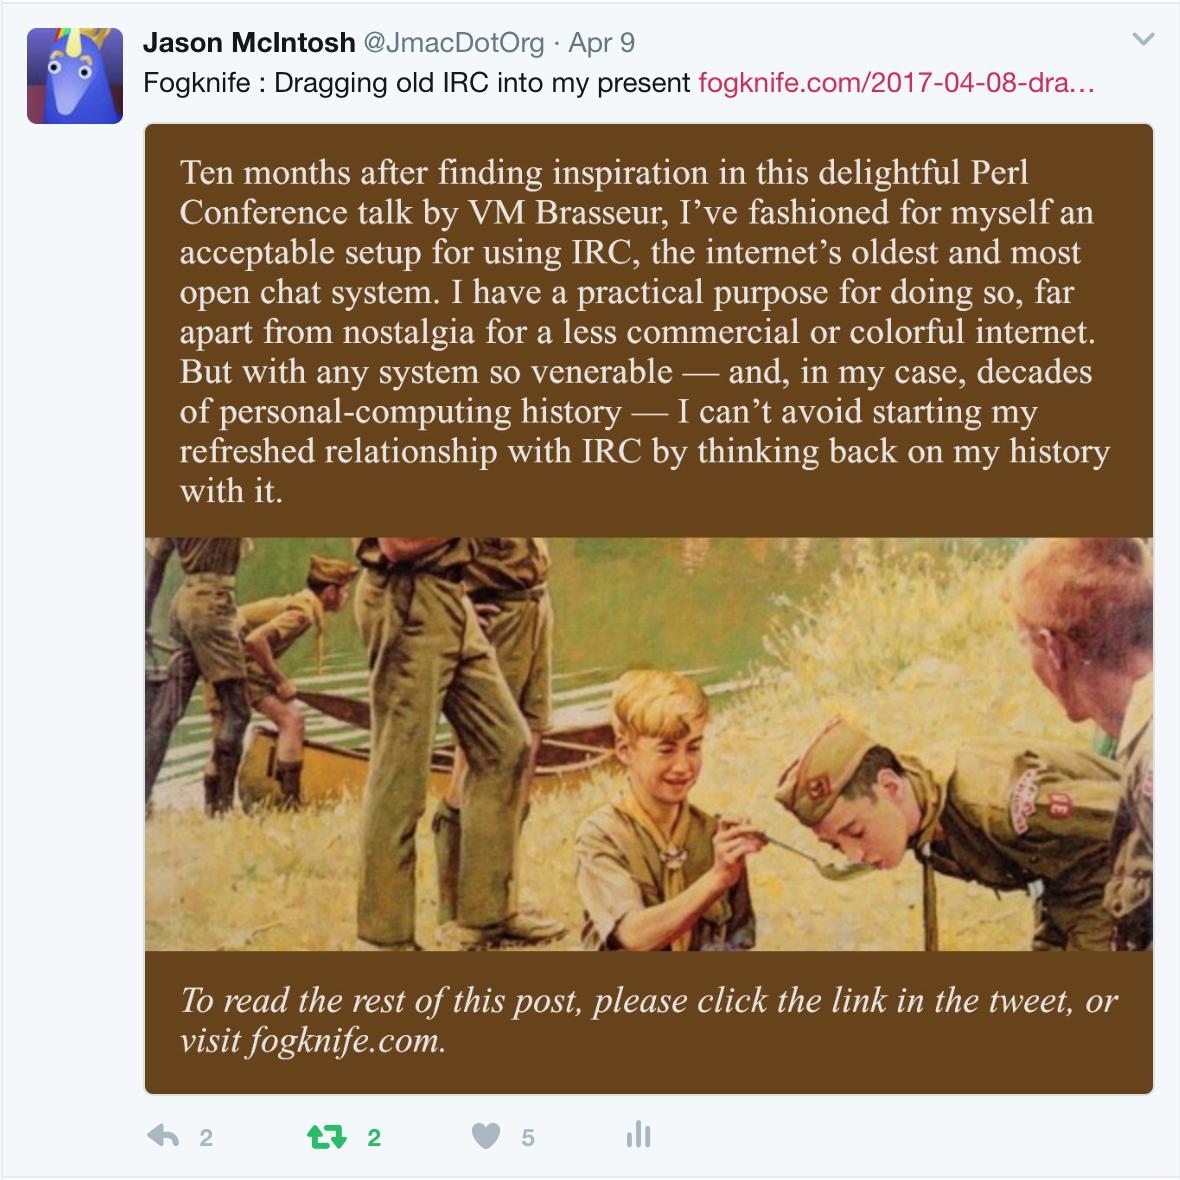 Screenshot of an alisio-generated tweet